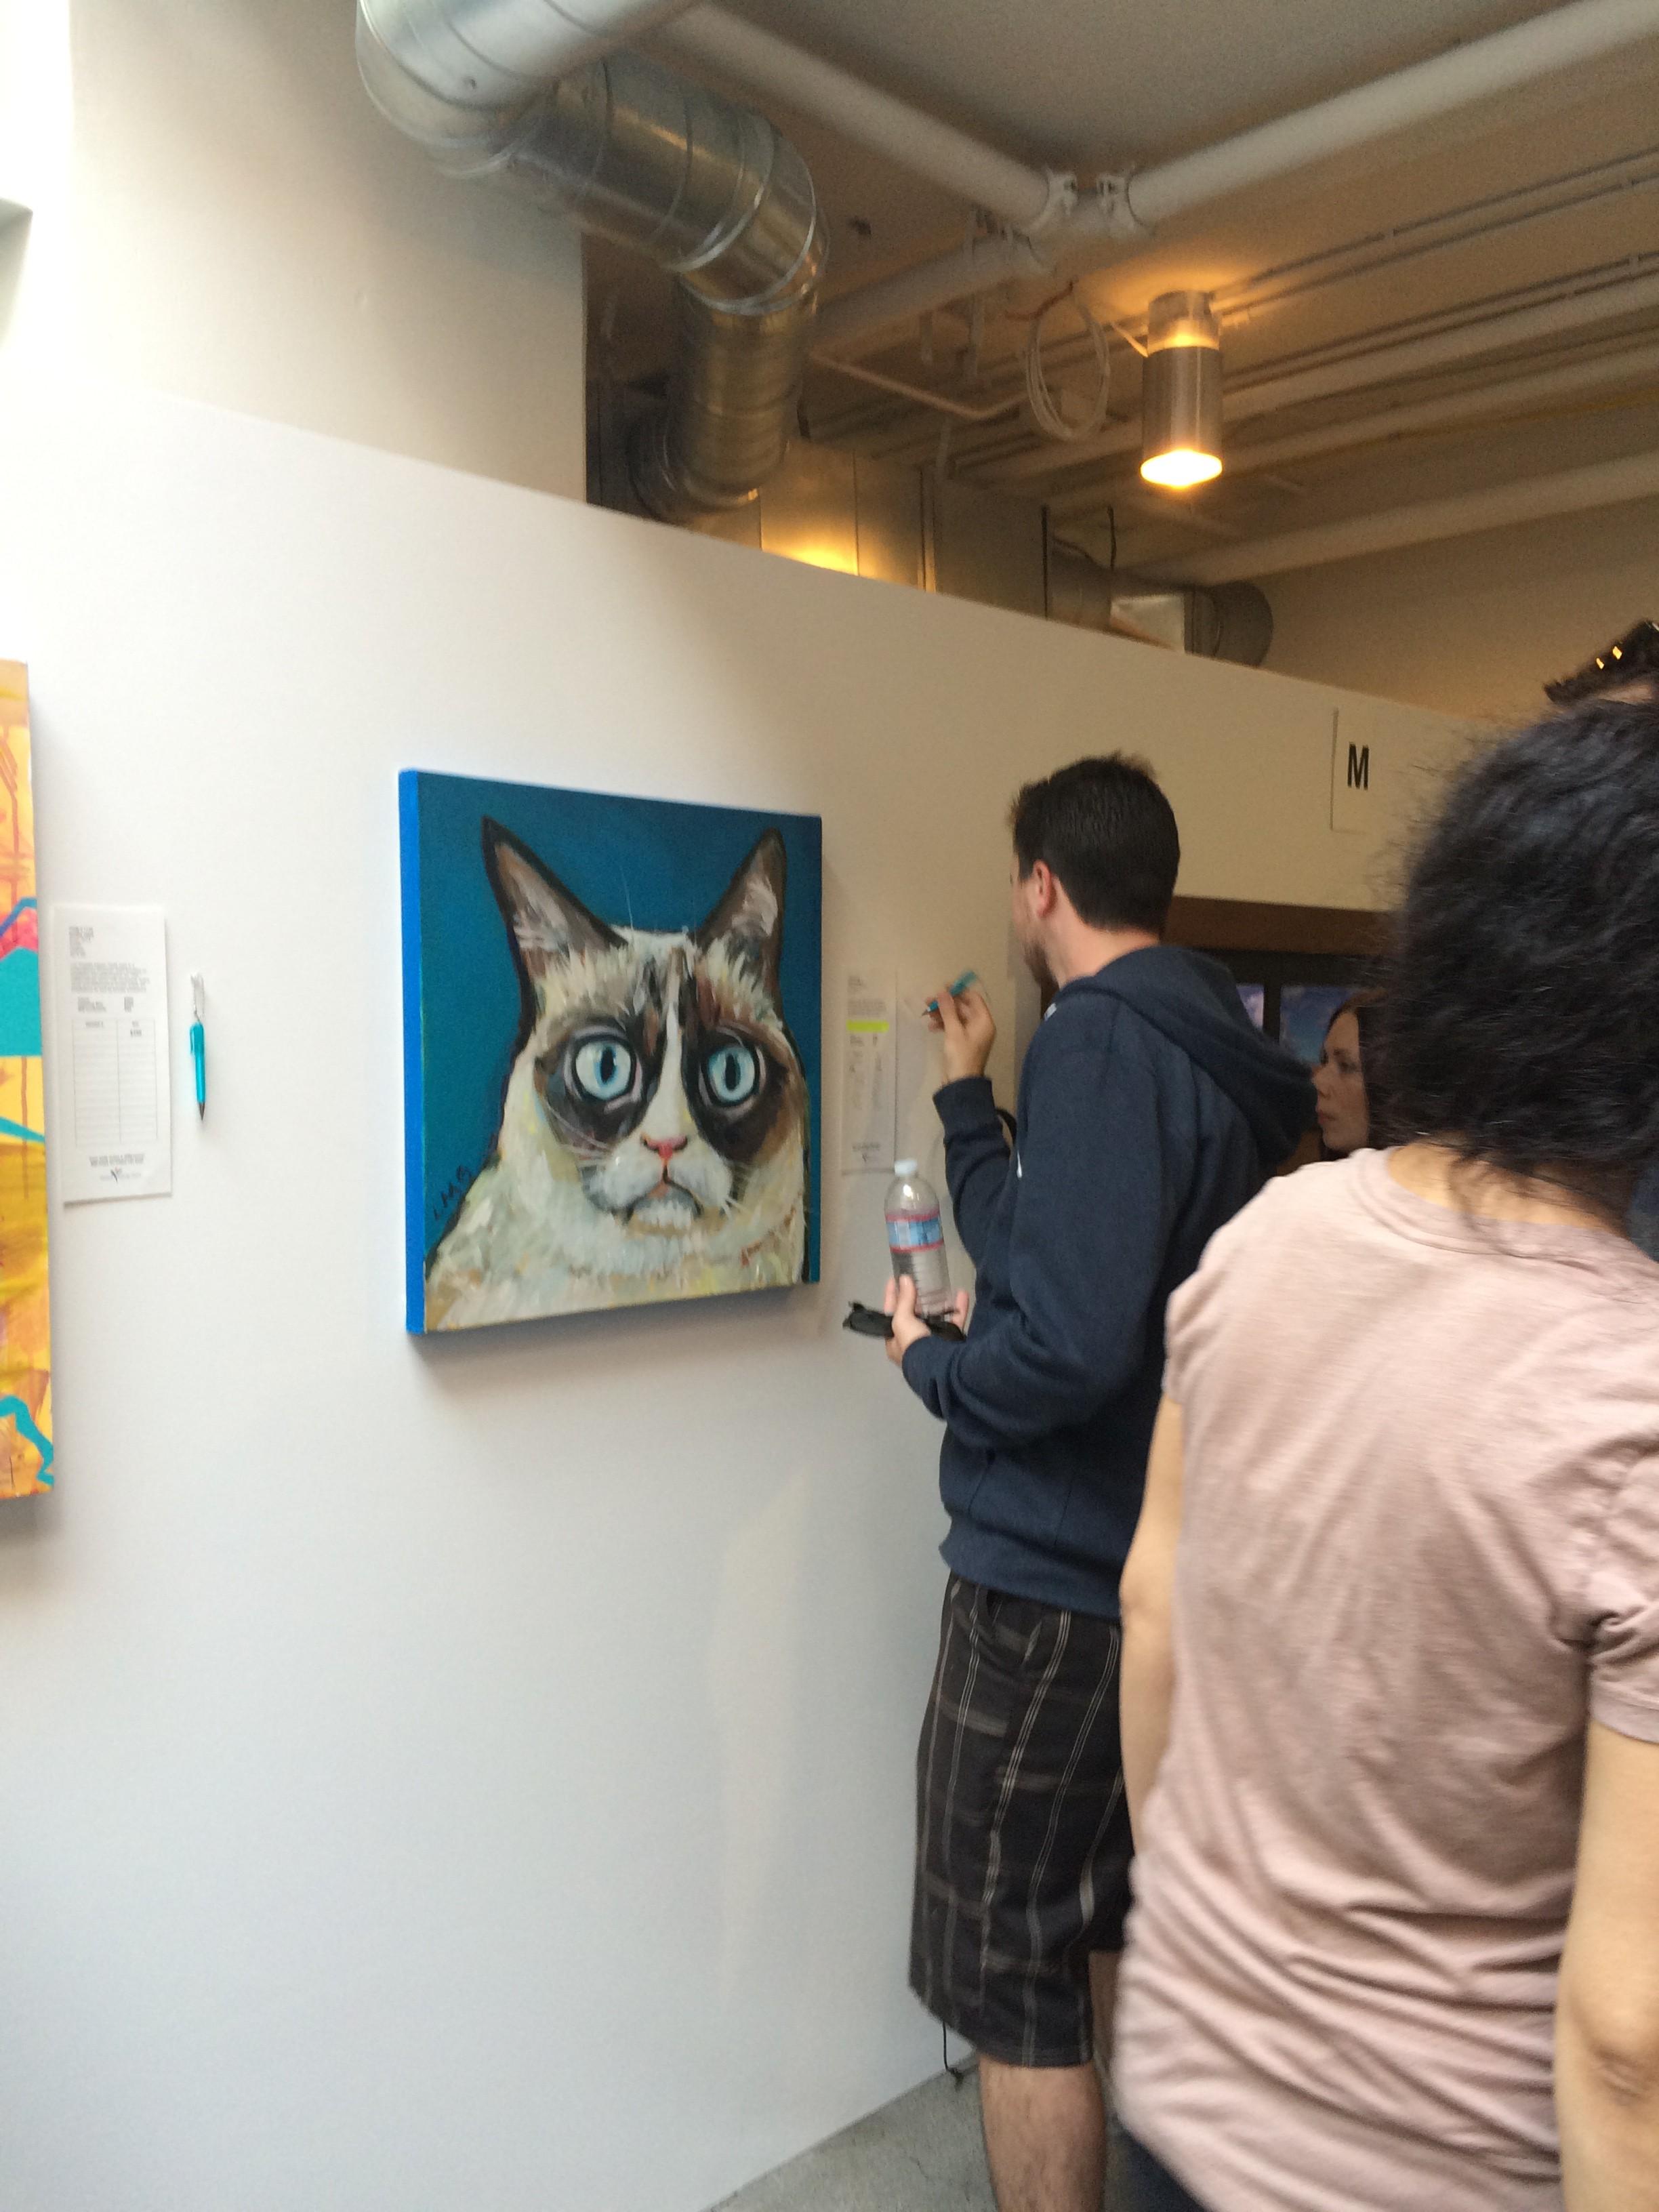 Man bidding on my painting